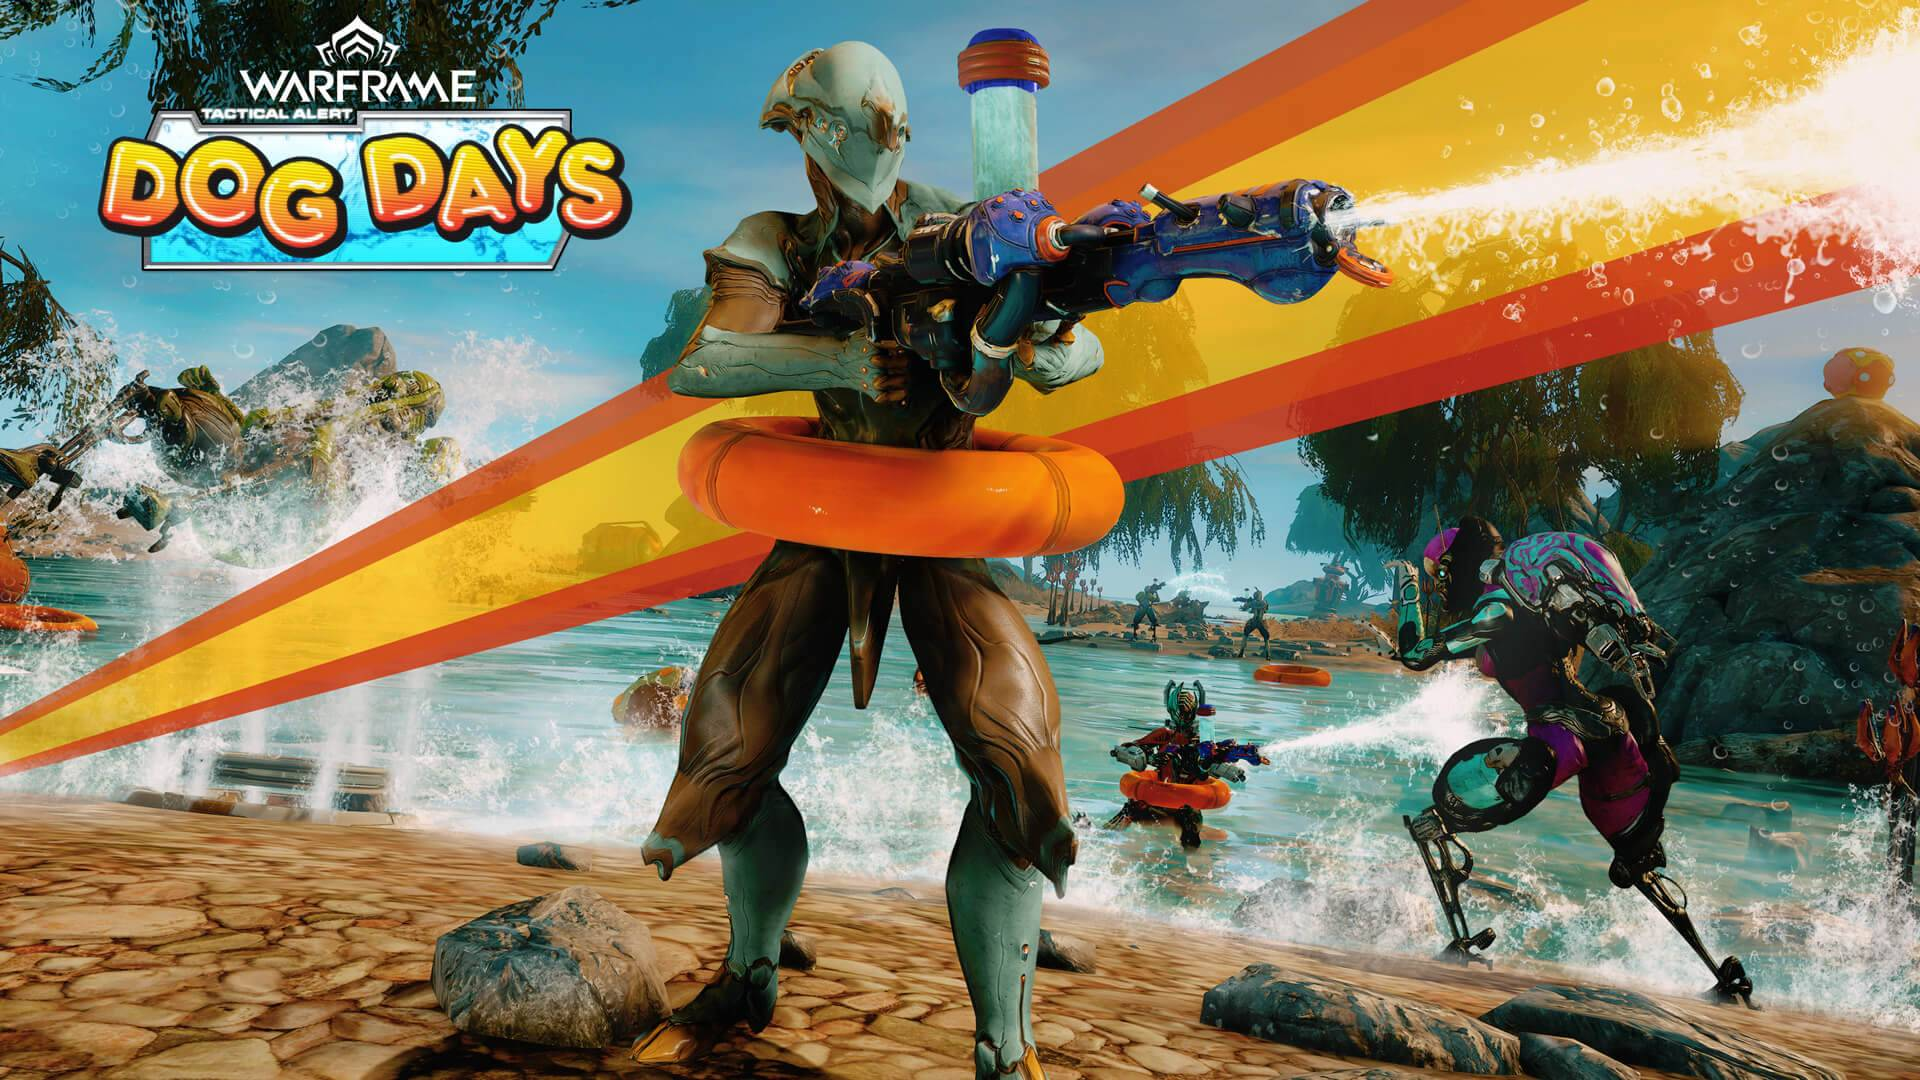 Warframe celebrates summer with Dog Days, a beach-themed event